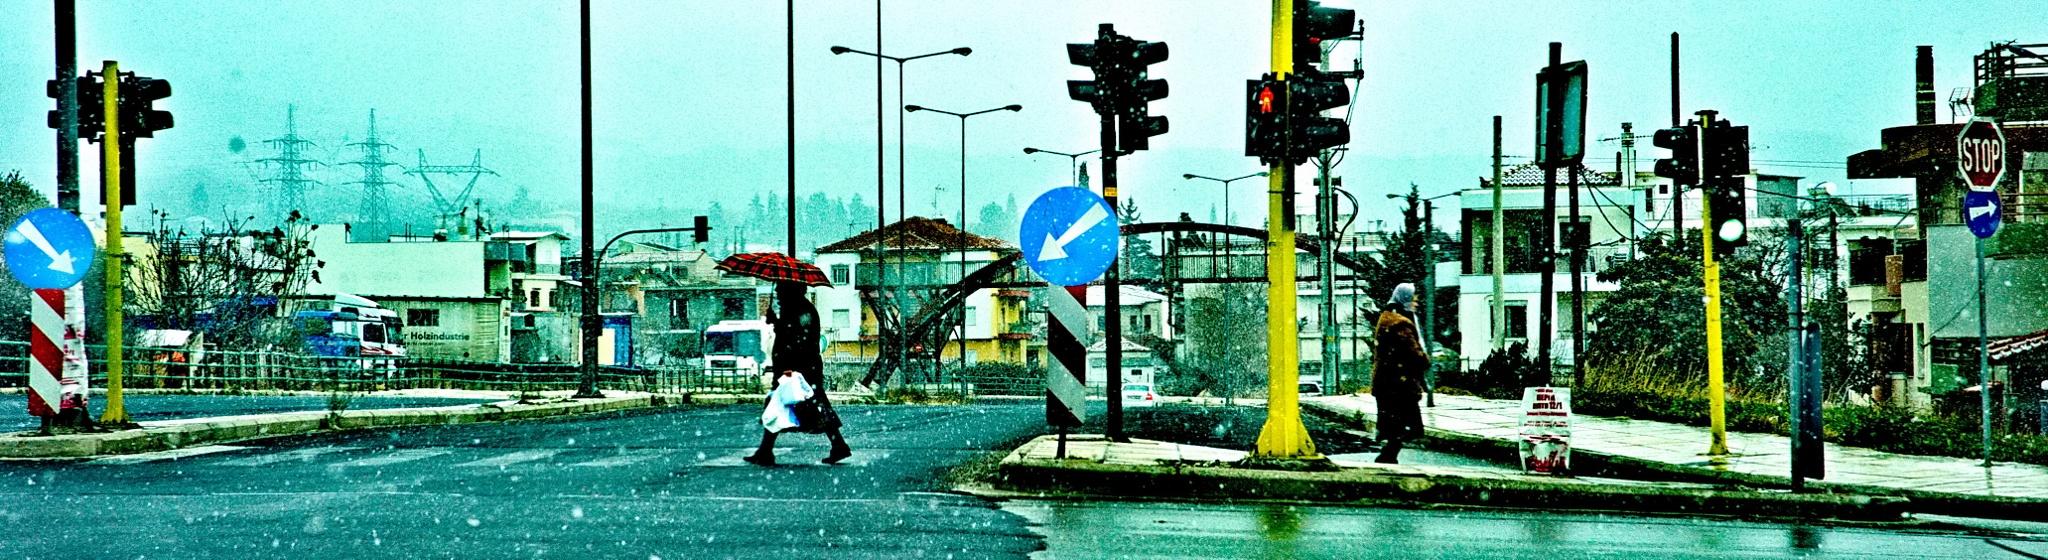 street  by Makis